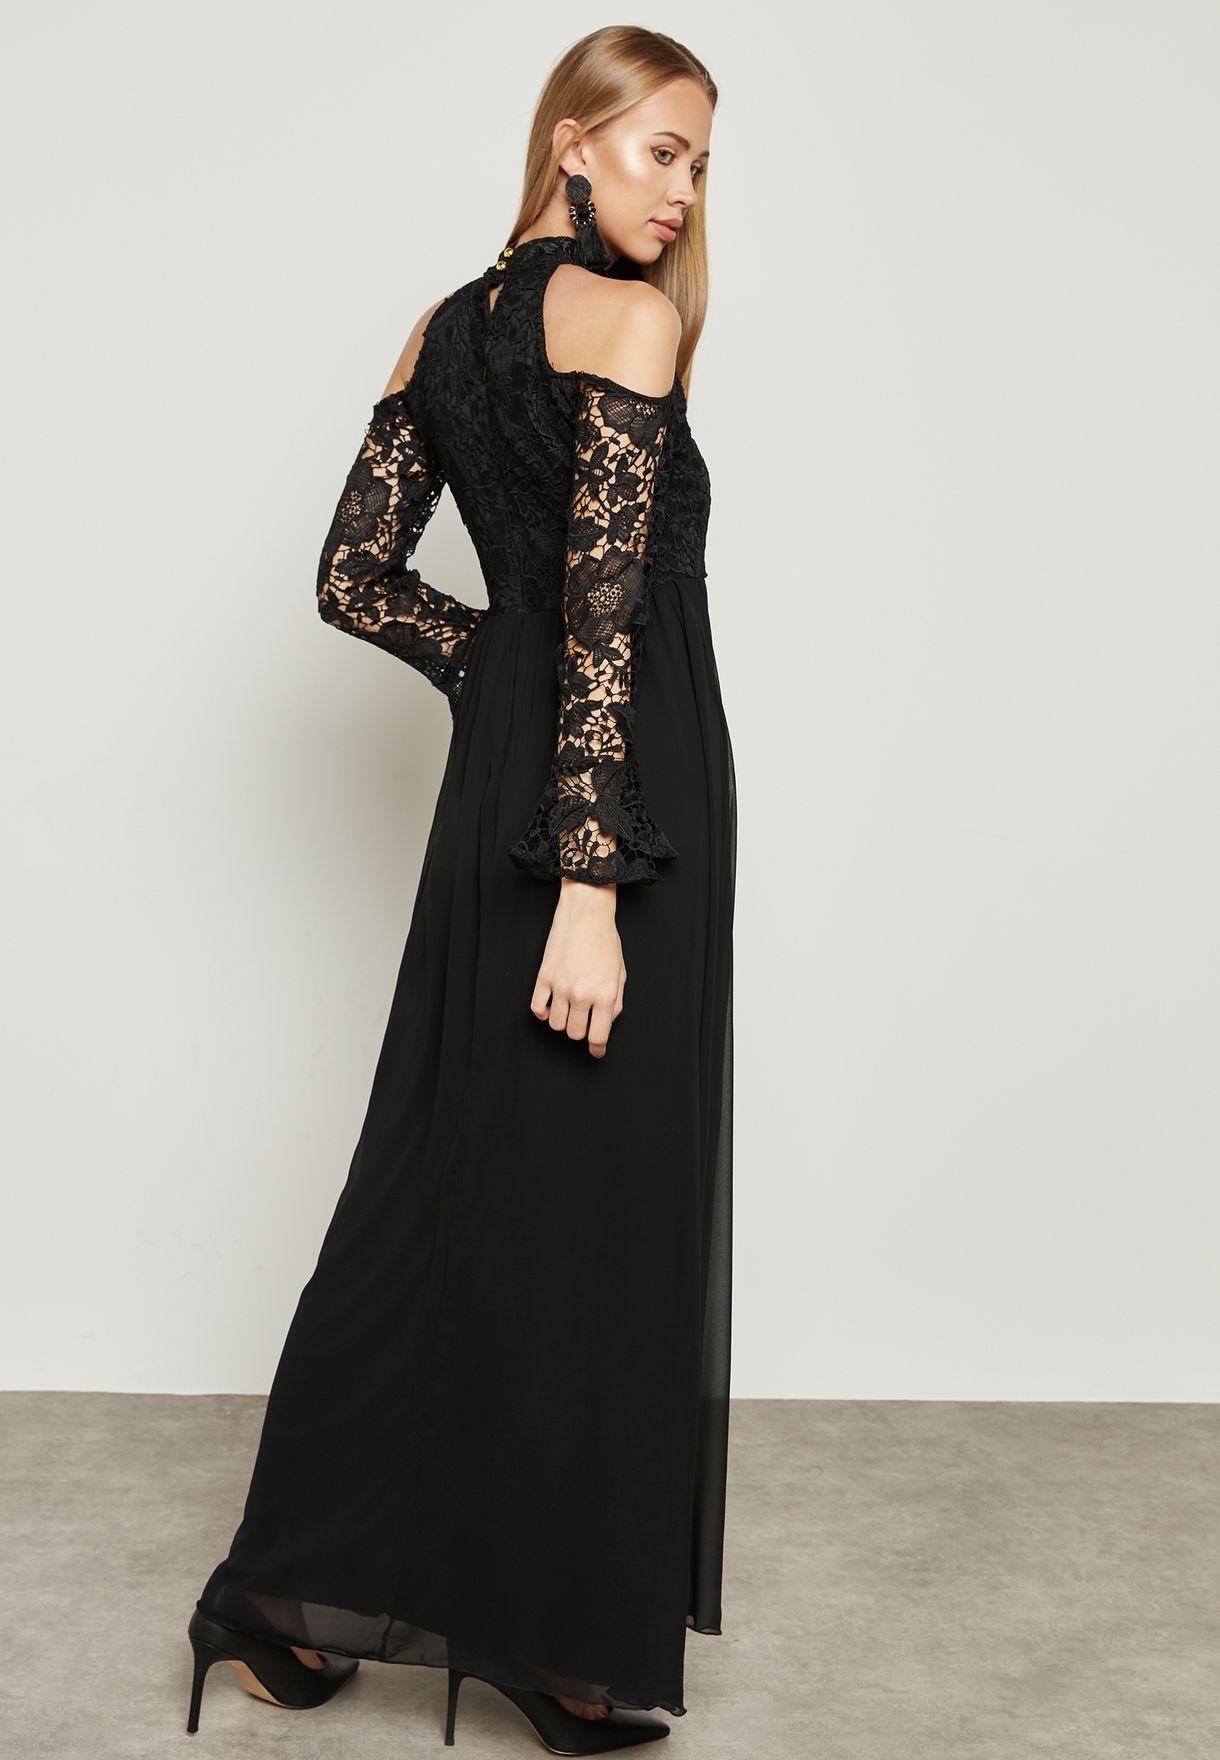 13261ced0edb94 Shop Ella Limited Edition black Lace Top Cold Shoulder Dress 2687 ...